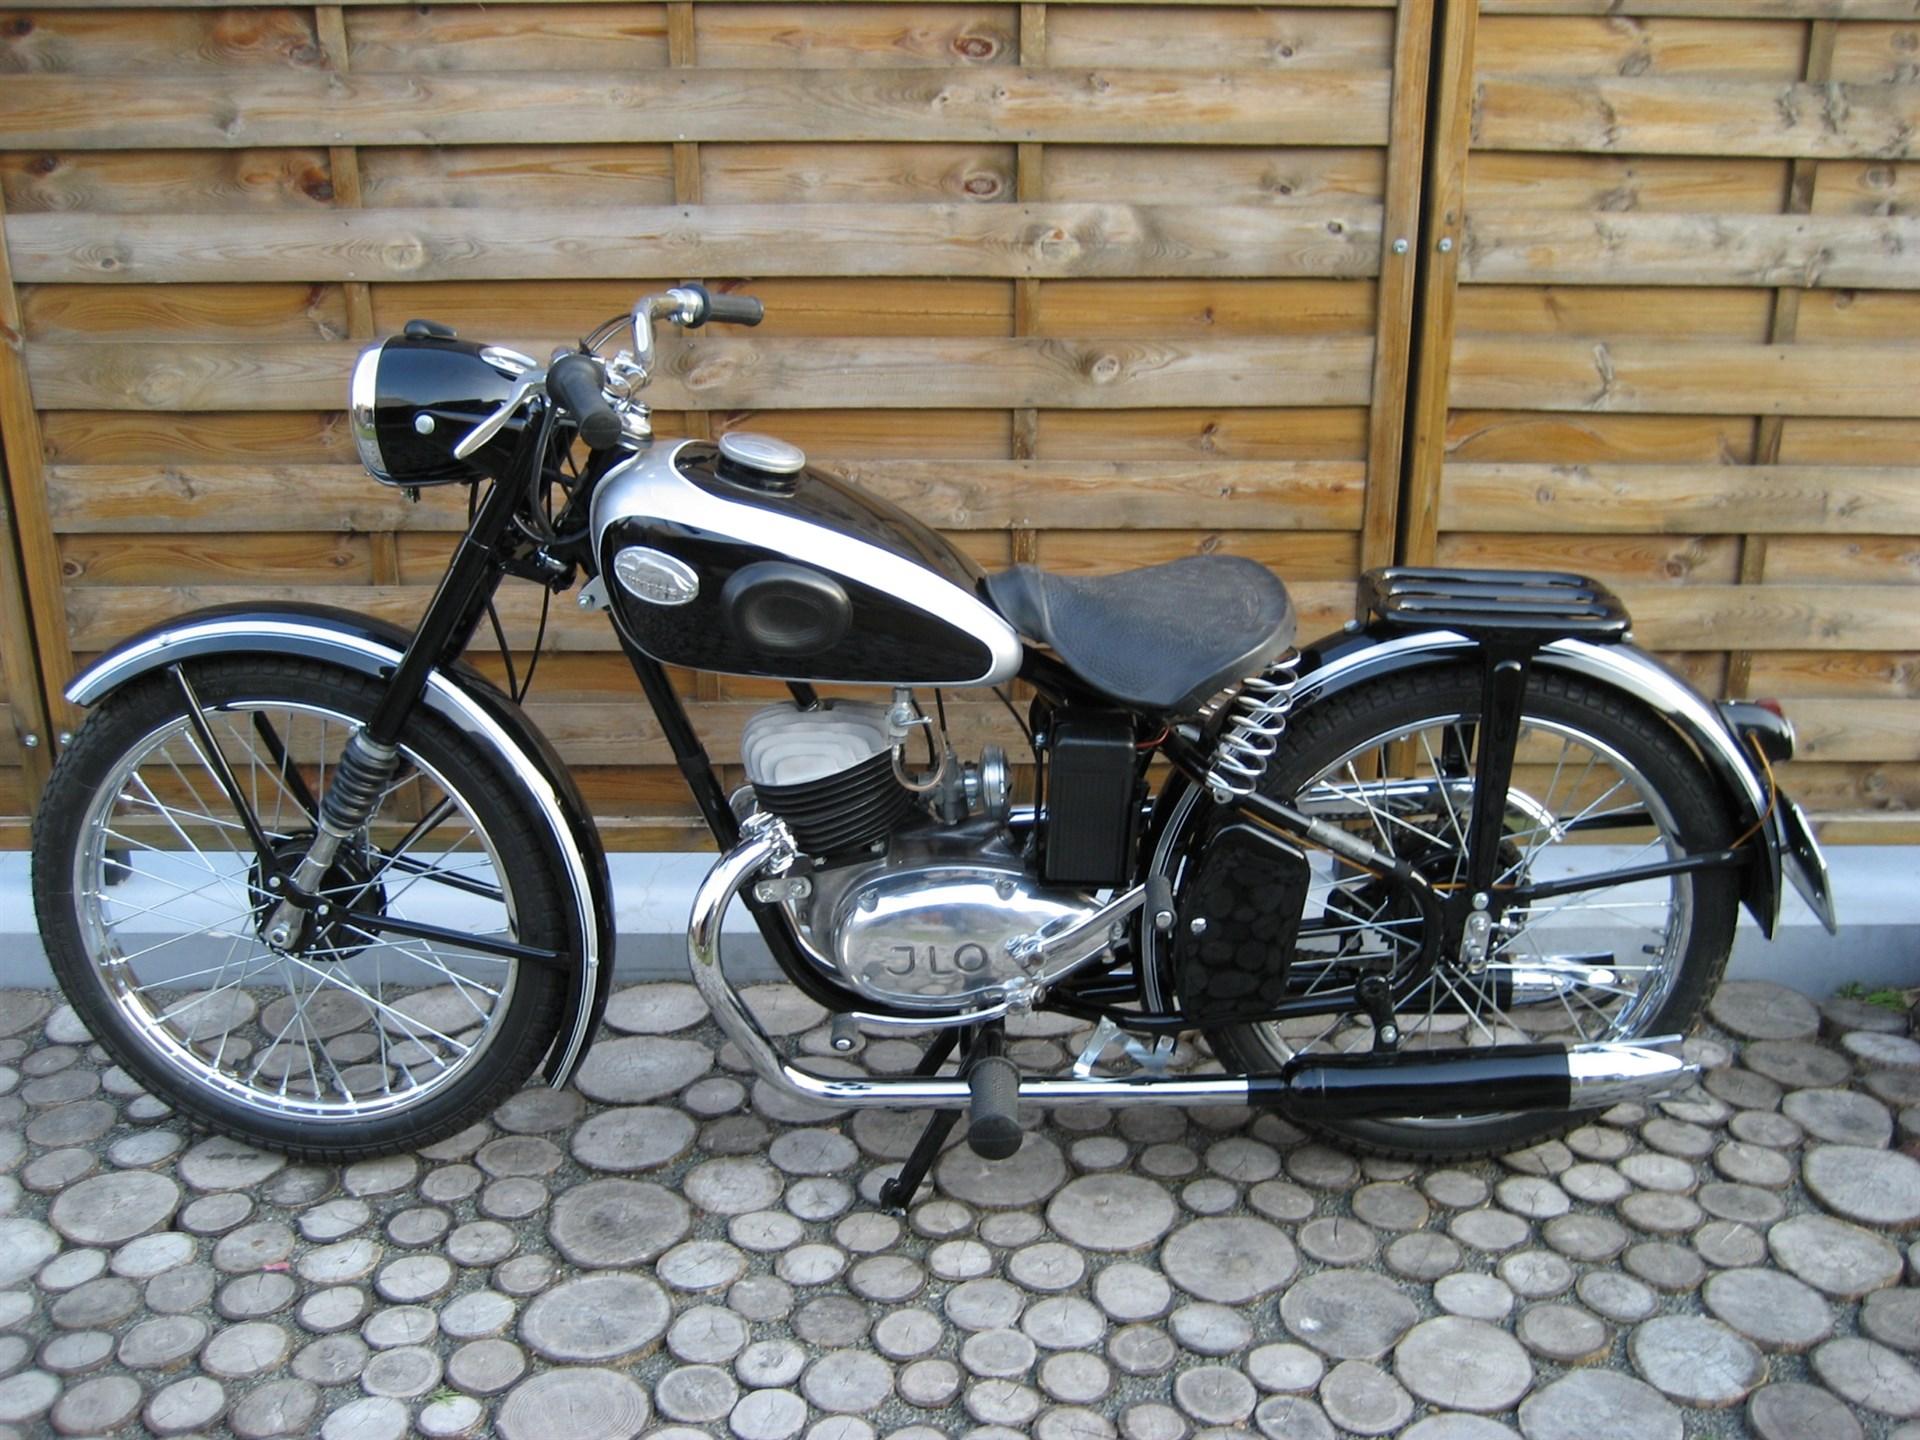 Express JLO 125 1955